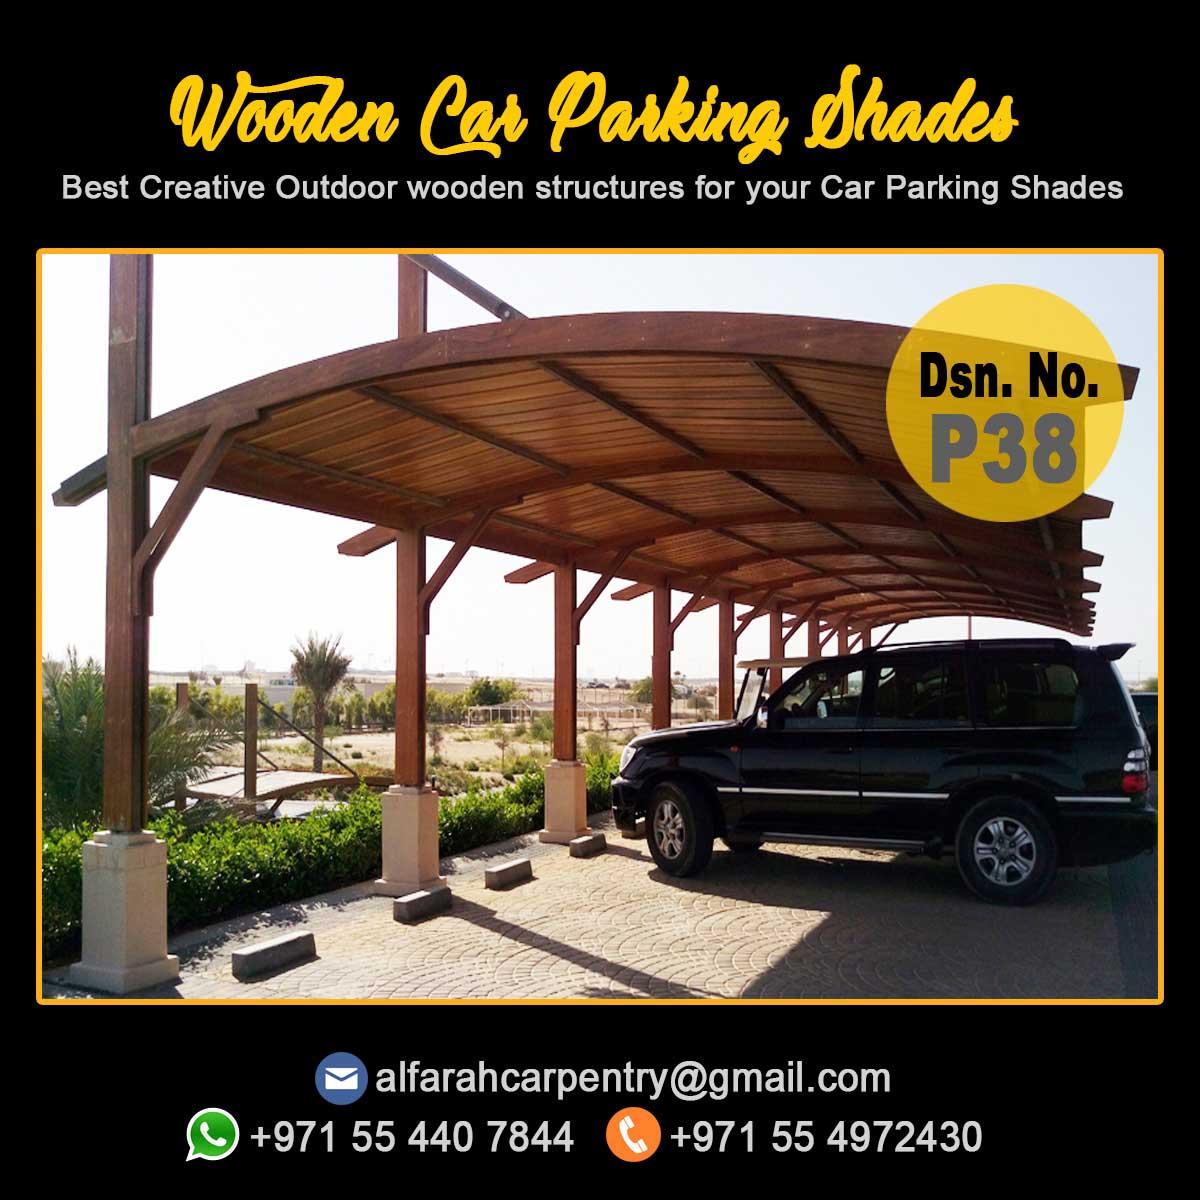 Car Parking Pergola Suppliers , Wooden car Parking , Car parking Wooden Shades Dubai5.jpg